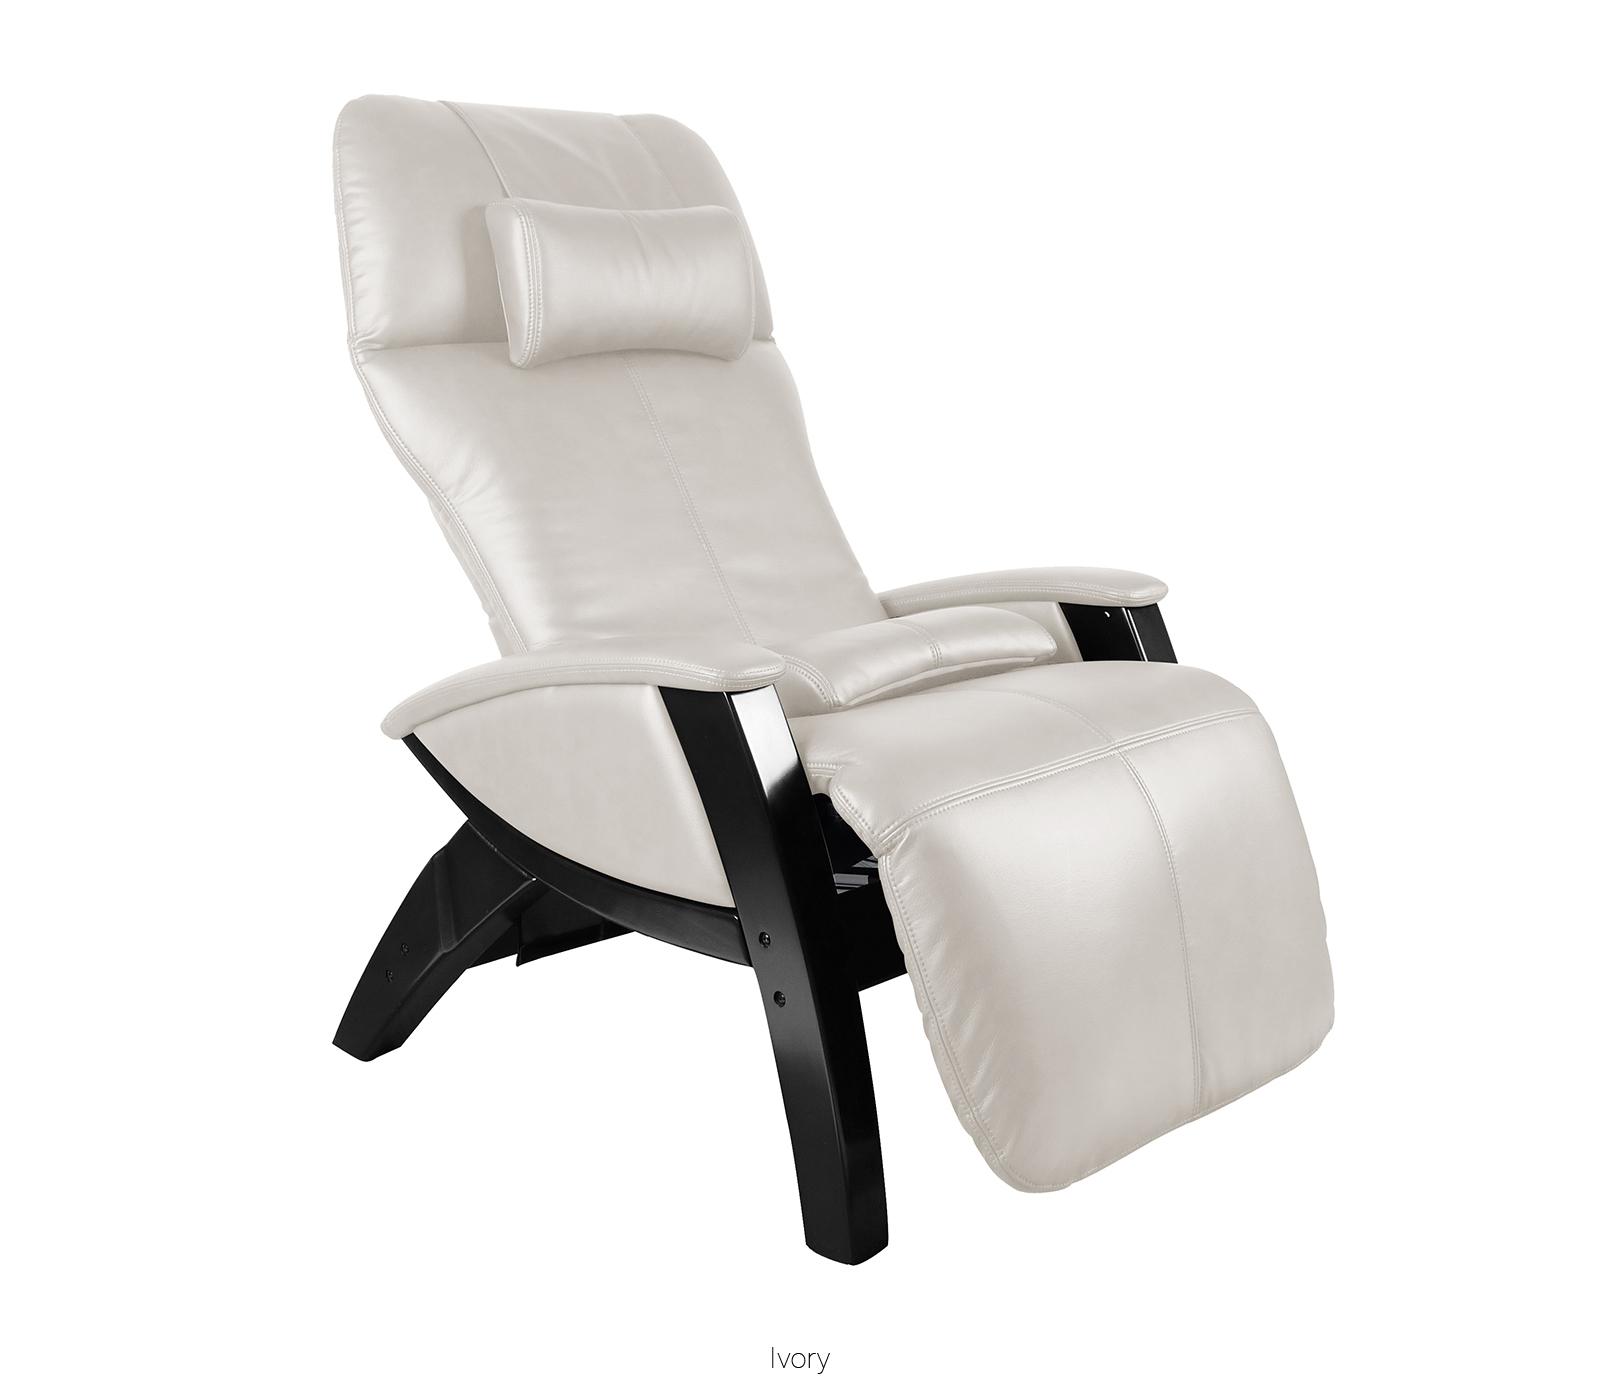 Cozzia Ag 6000 The Zero Gravity Vibration Massage Chair